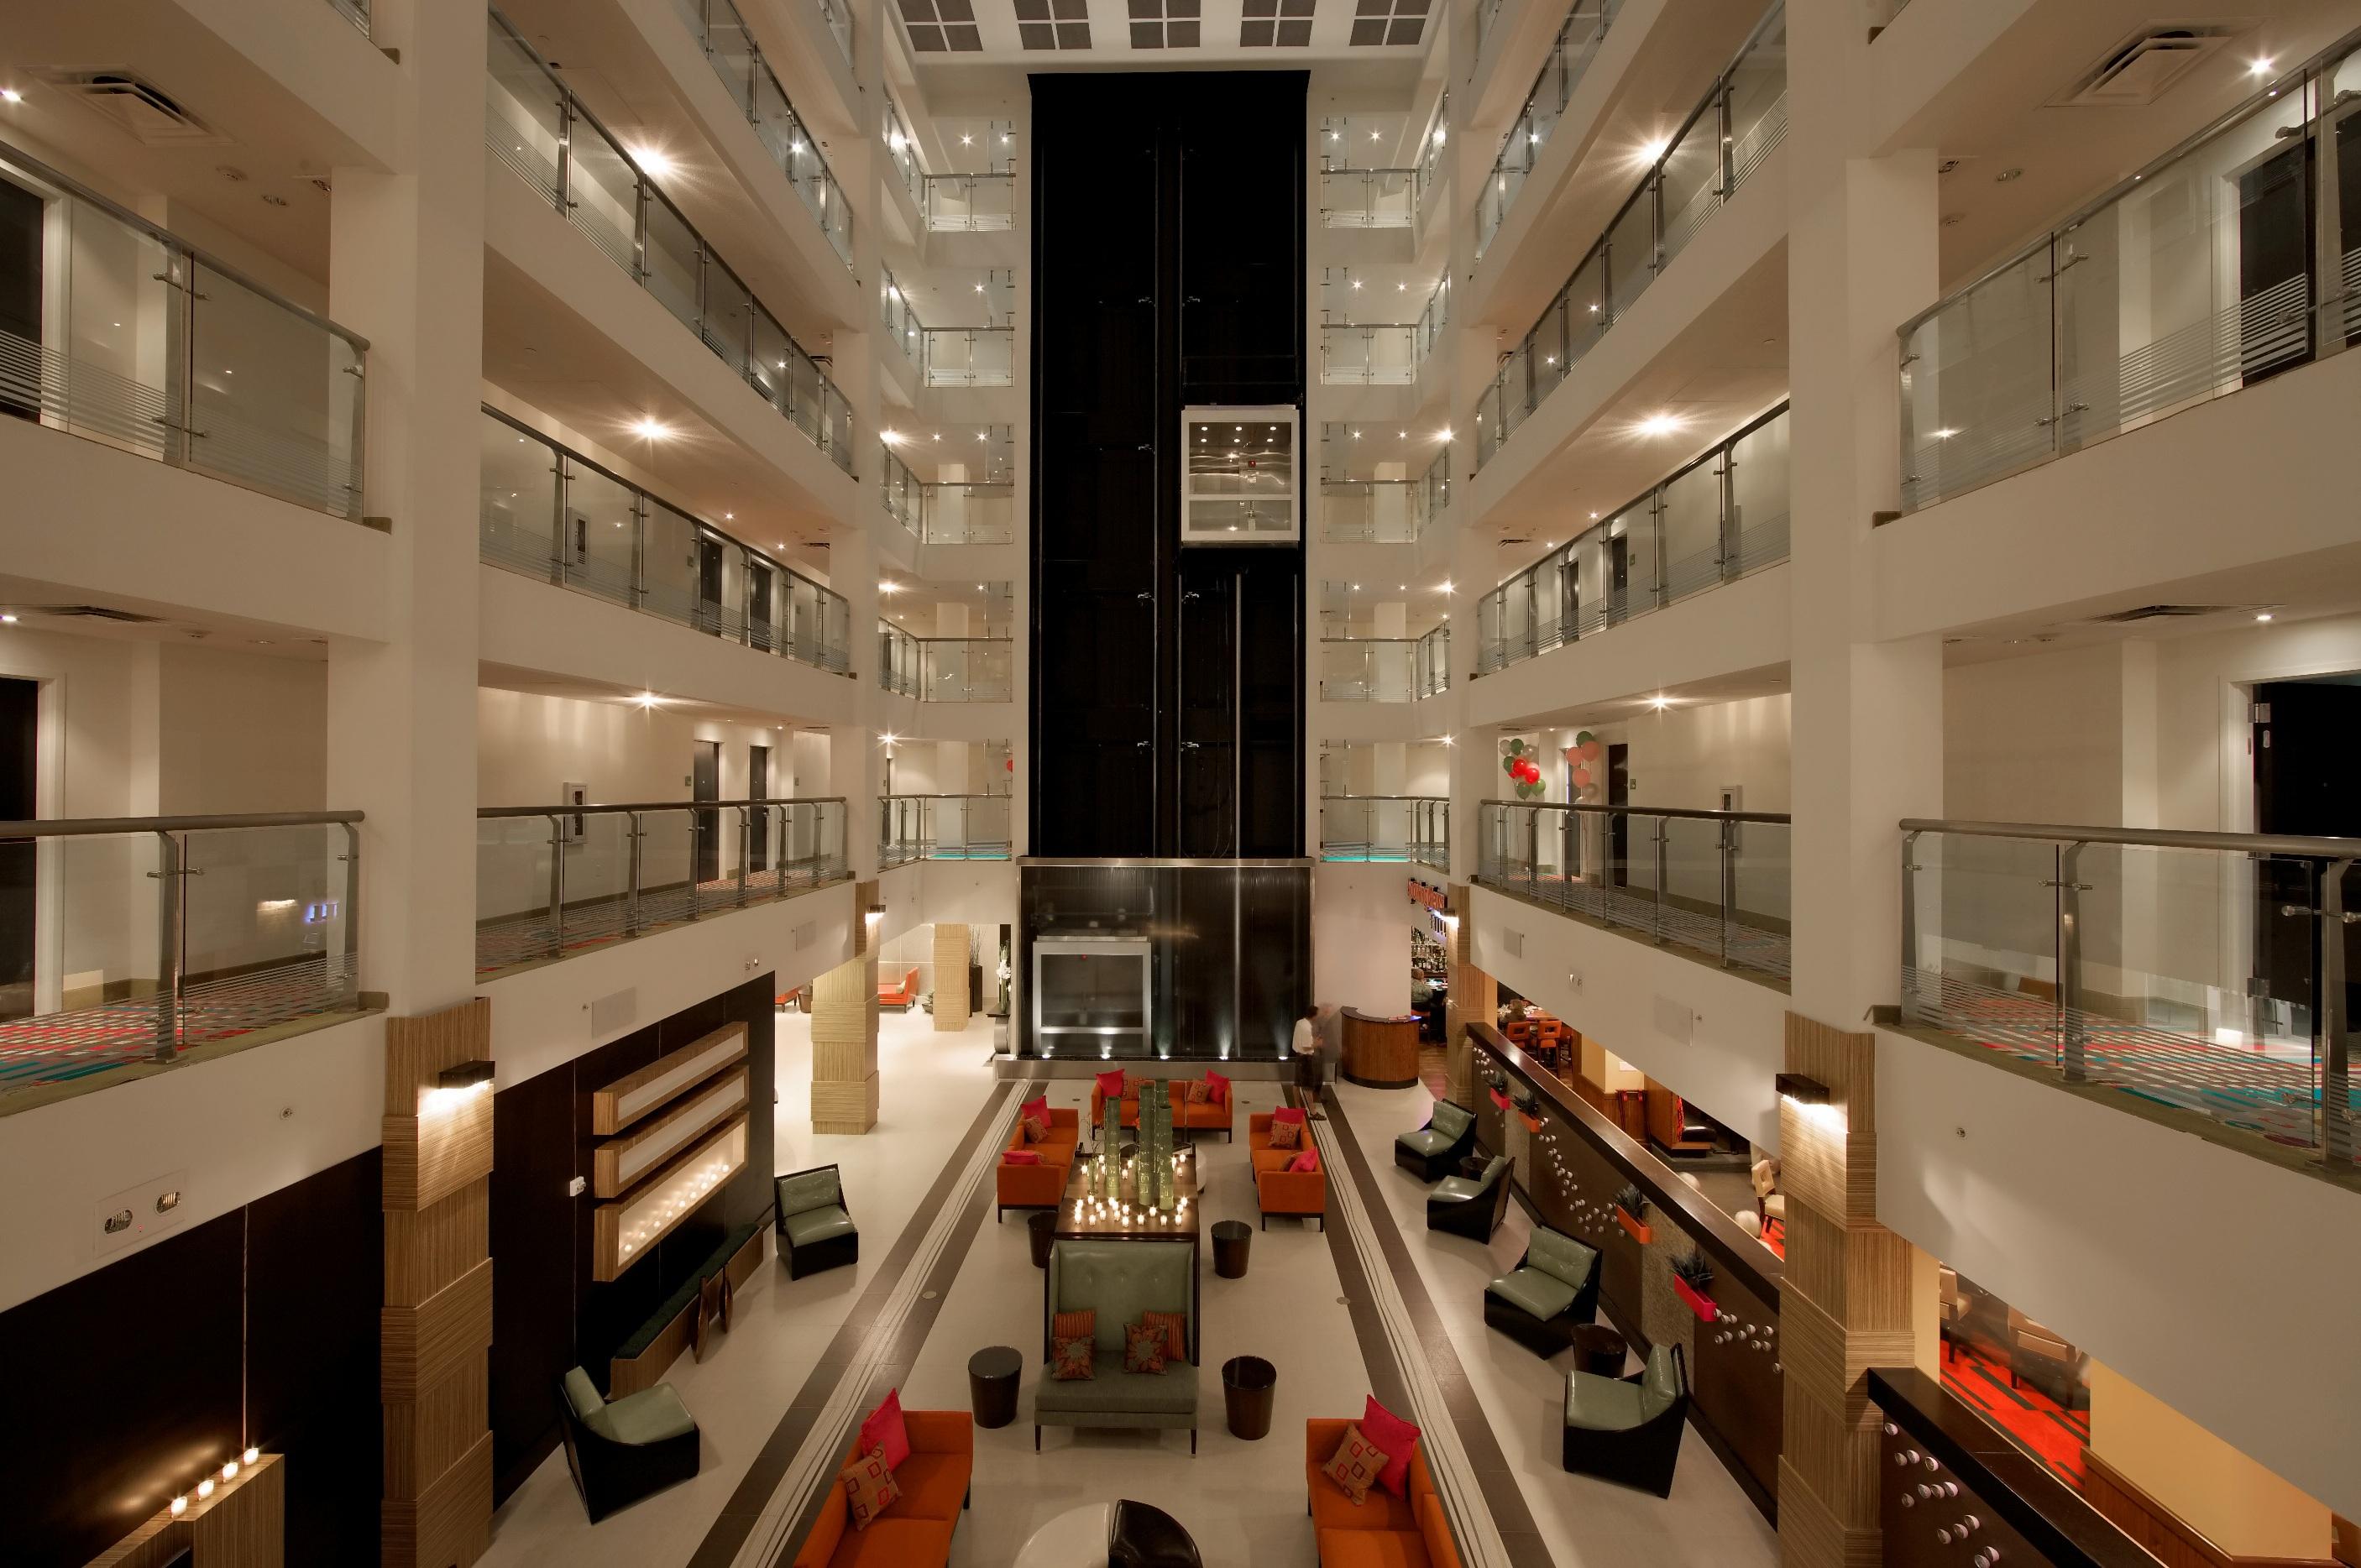 Hotels Airport Hong Kong International S Temple Salt Lake City Ut